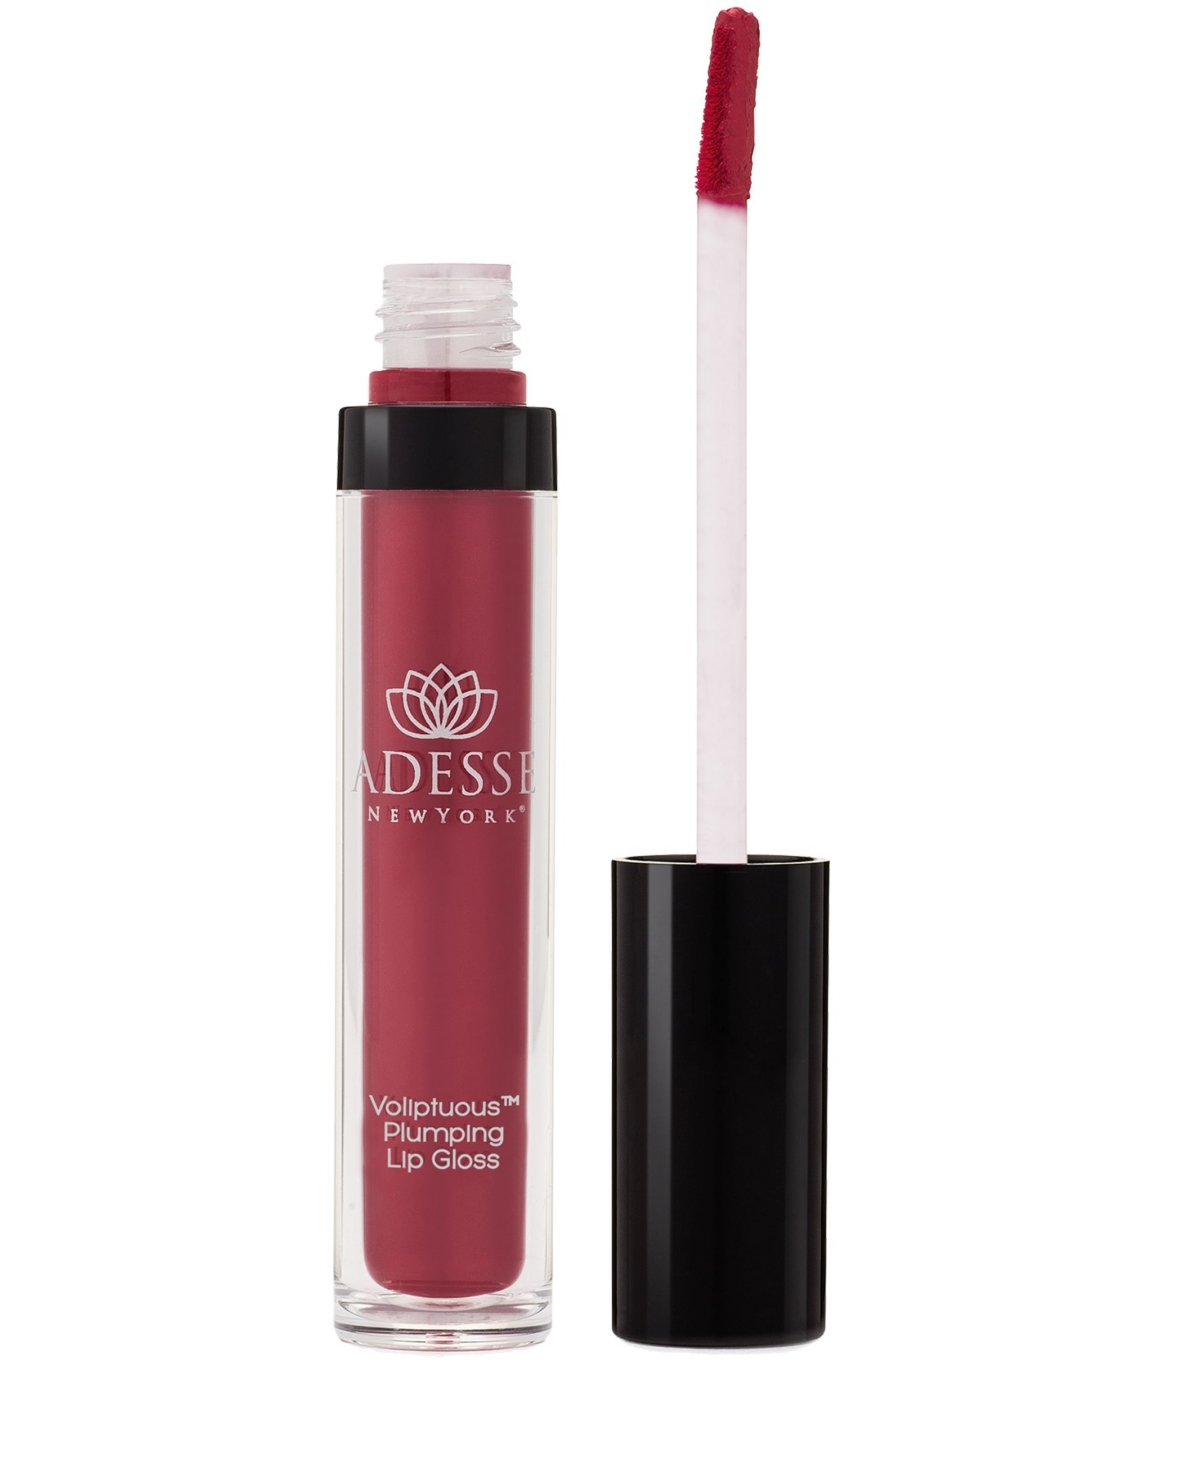 Voliptuous Plumping Lip Gloss